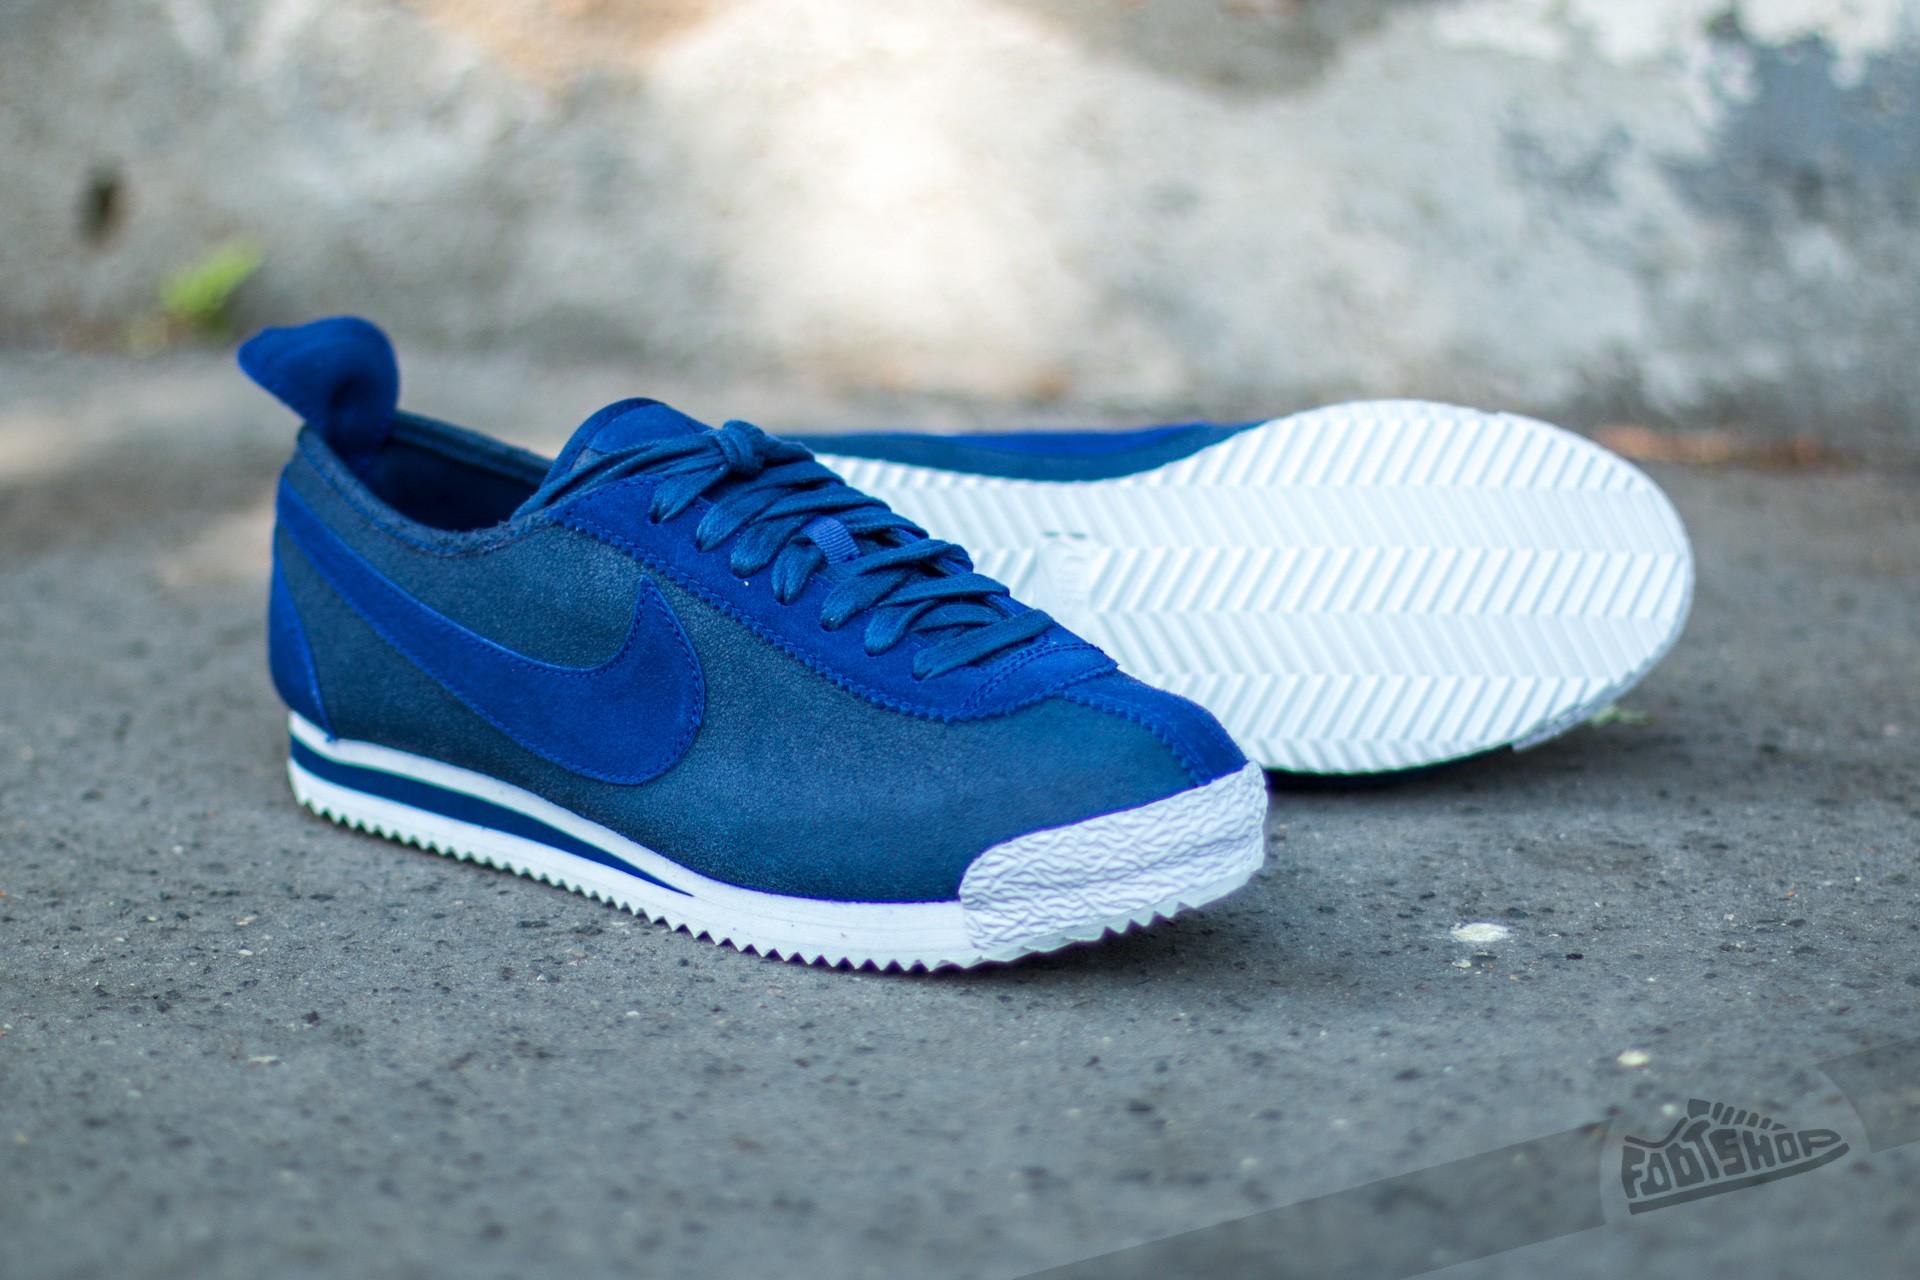 fecha límite flauta borracho  Zapatillas Hombre Nike Cortez '72 Loyal Blue/ Loyal Blue- Metallic Pewter-  White | Footshop